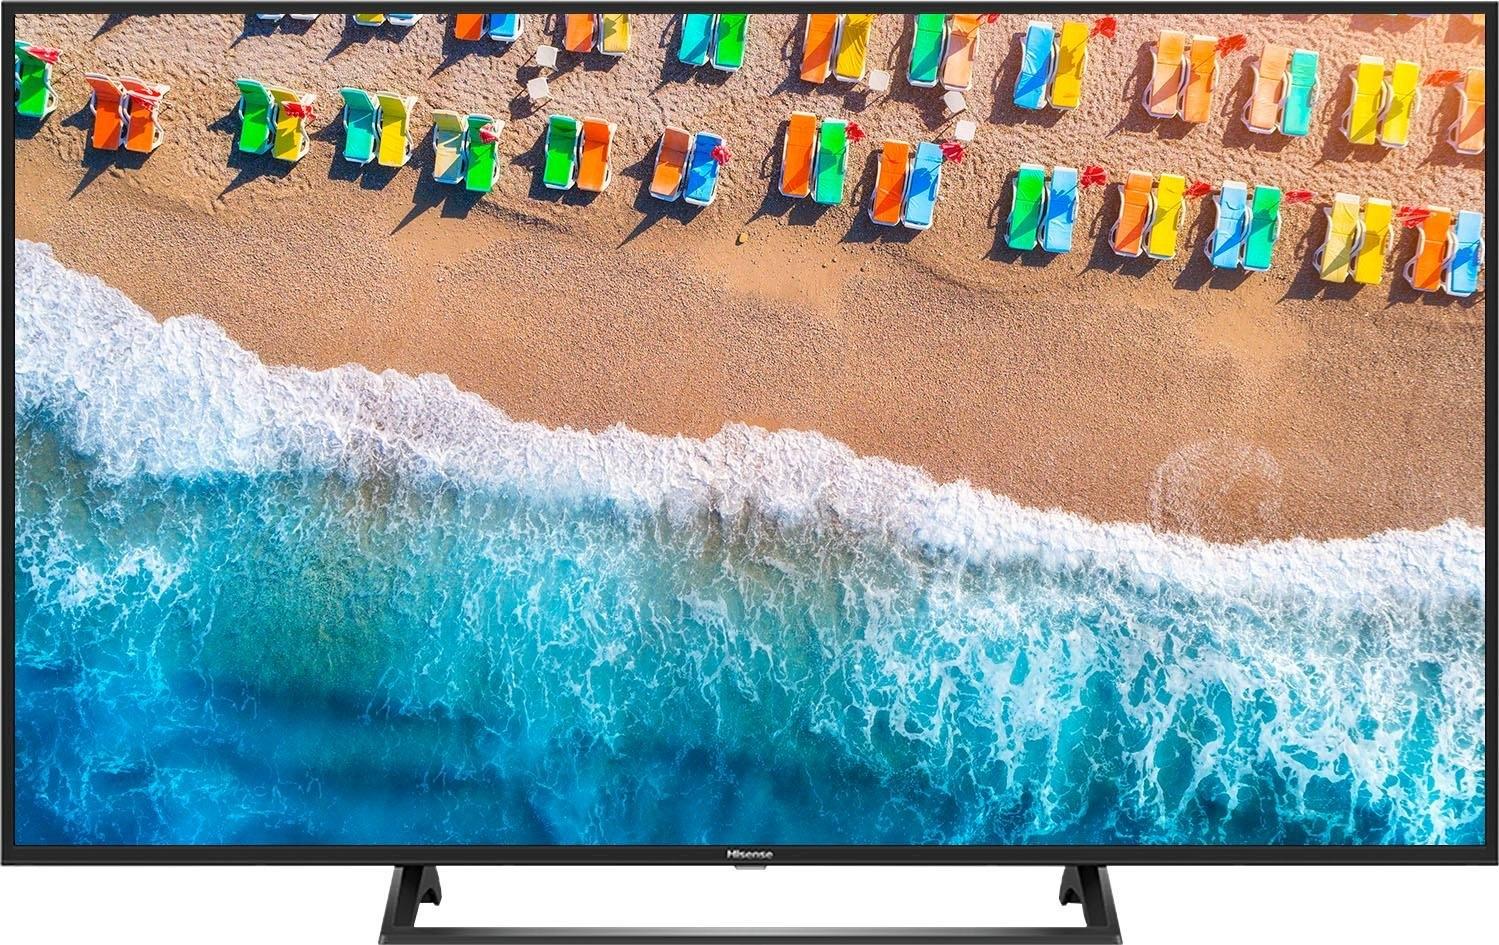 Hisense H65BE7200 led-tv (163 cm / 65 inch), 4K Ultra HD, smart-tv - gratis ruilen op otto.nl